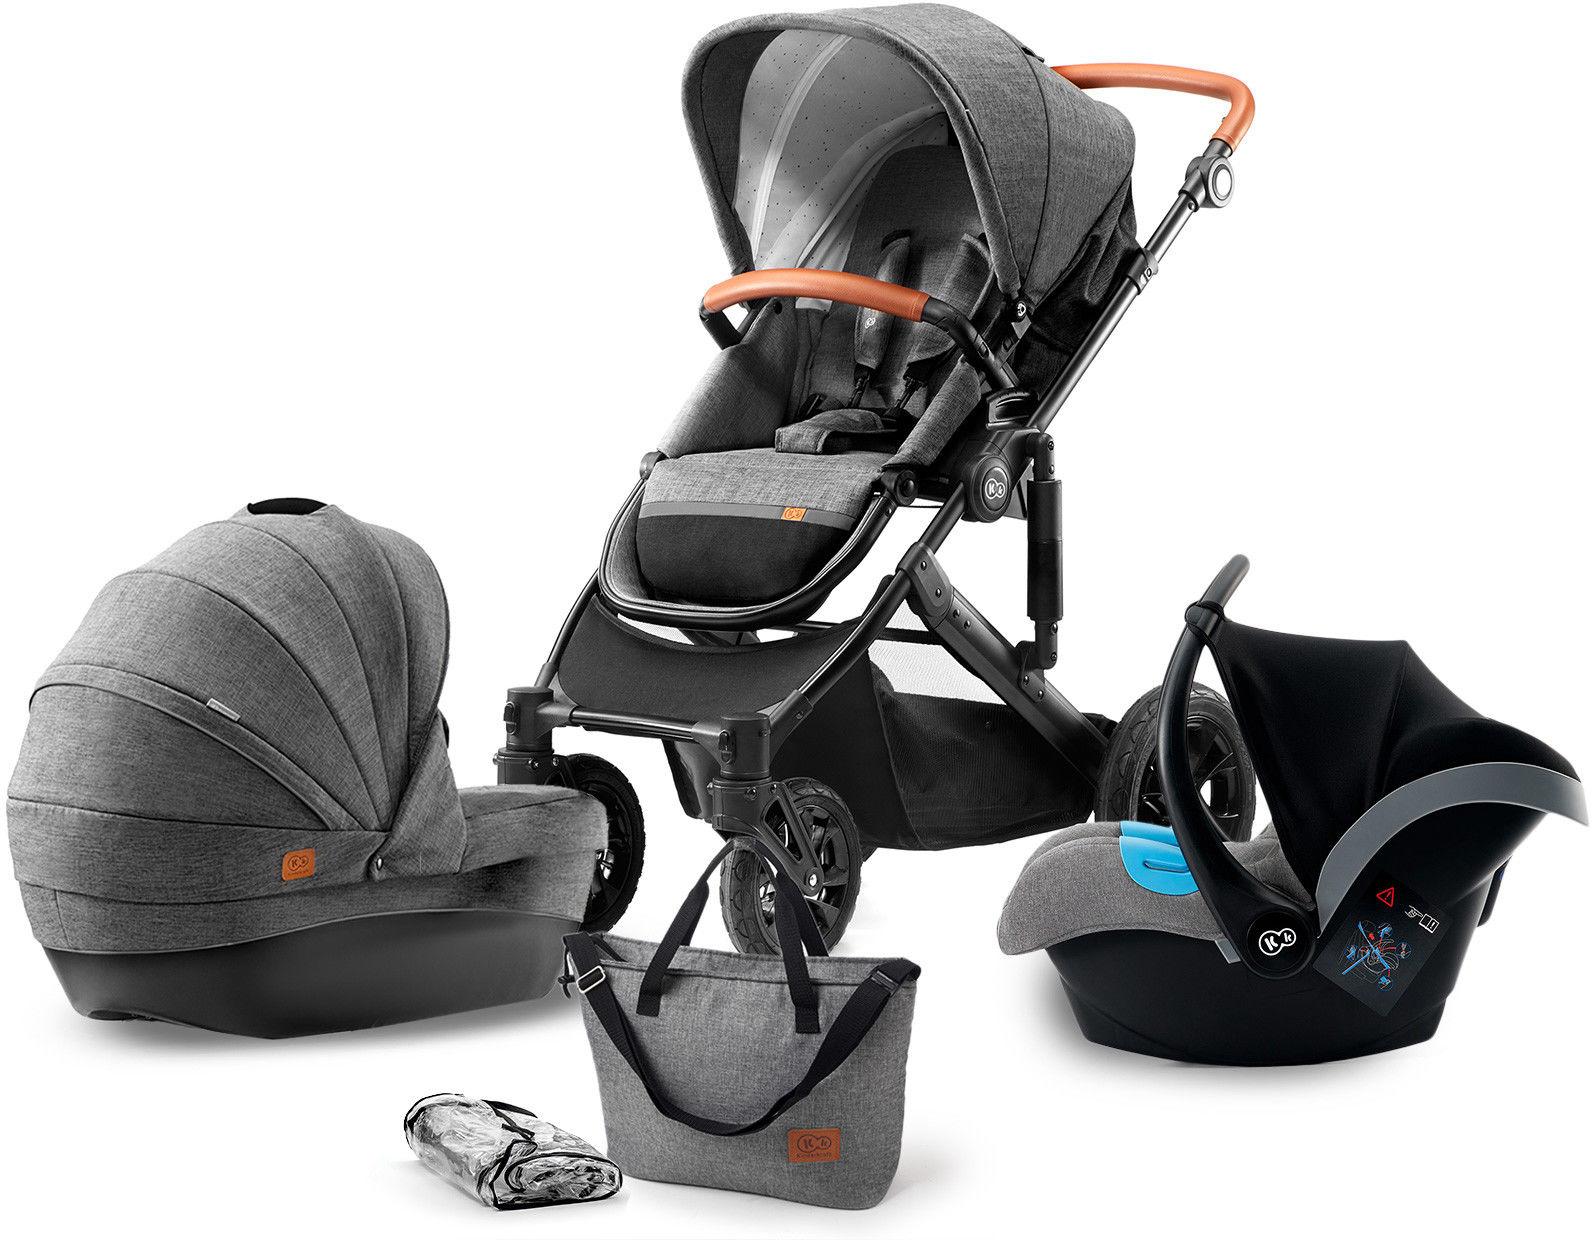 Kinderkraft Prime Wózek uniwersalny 3w1 szary + Mommy Bag